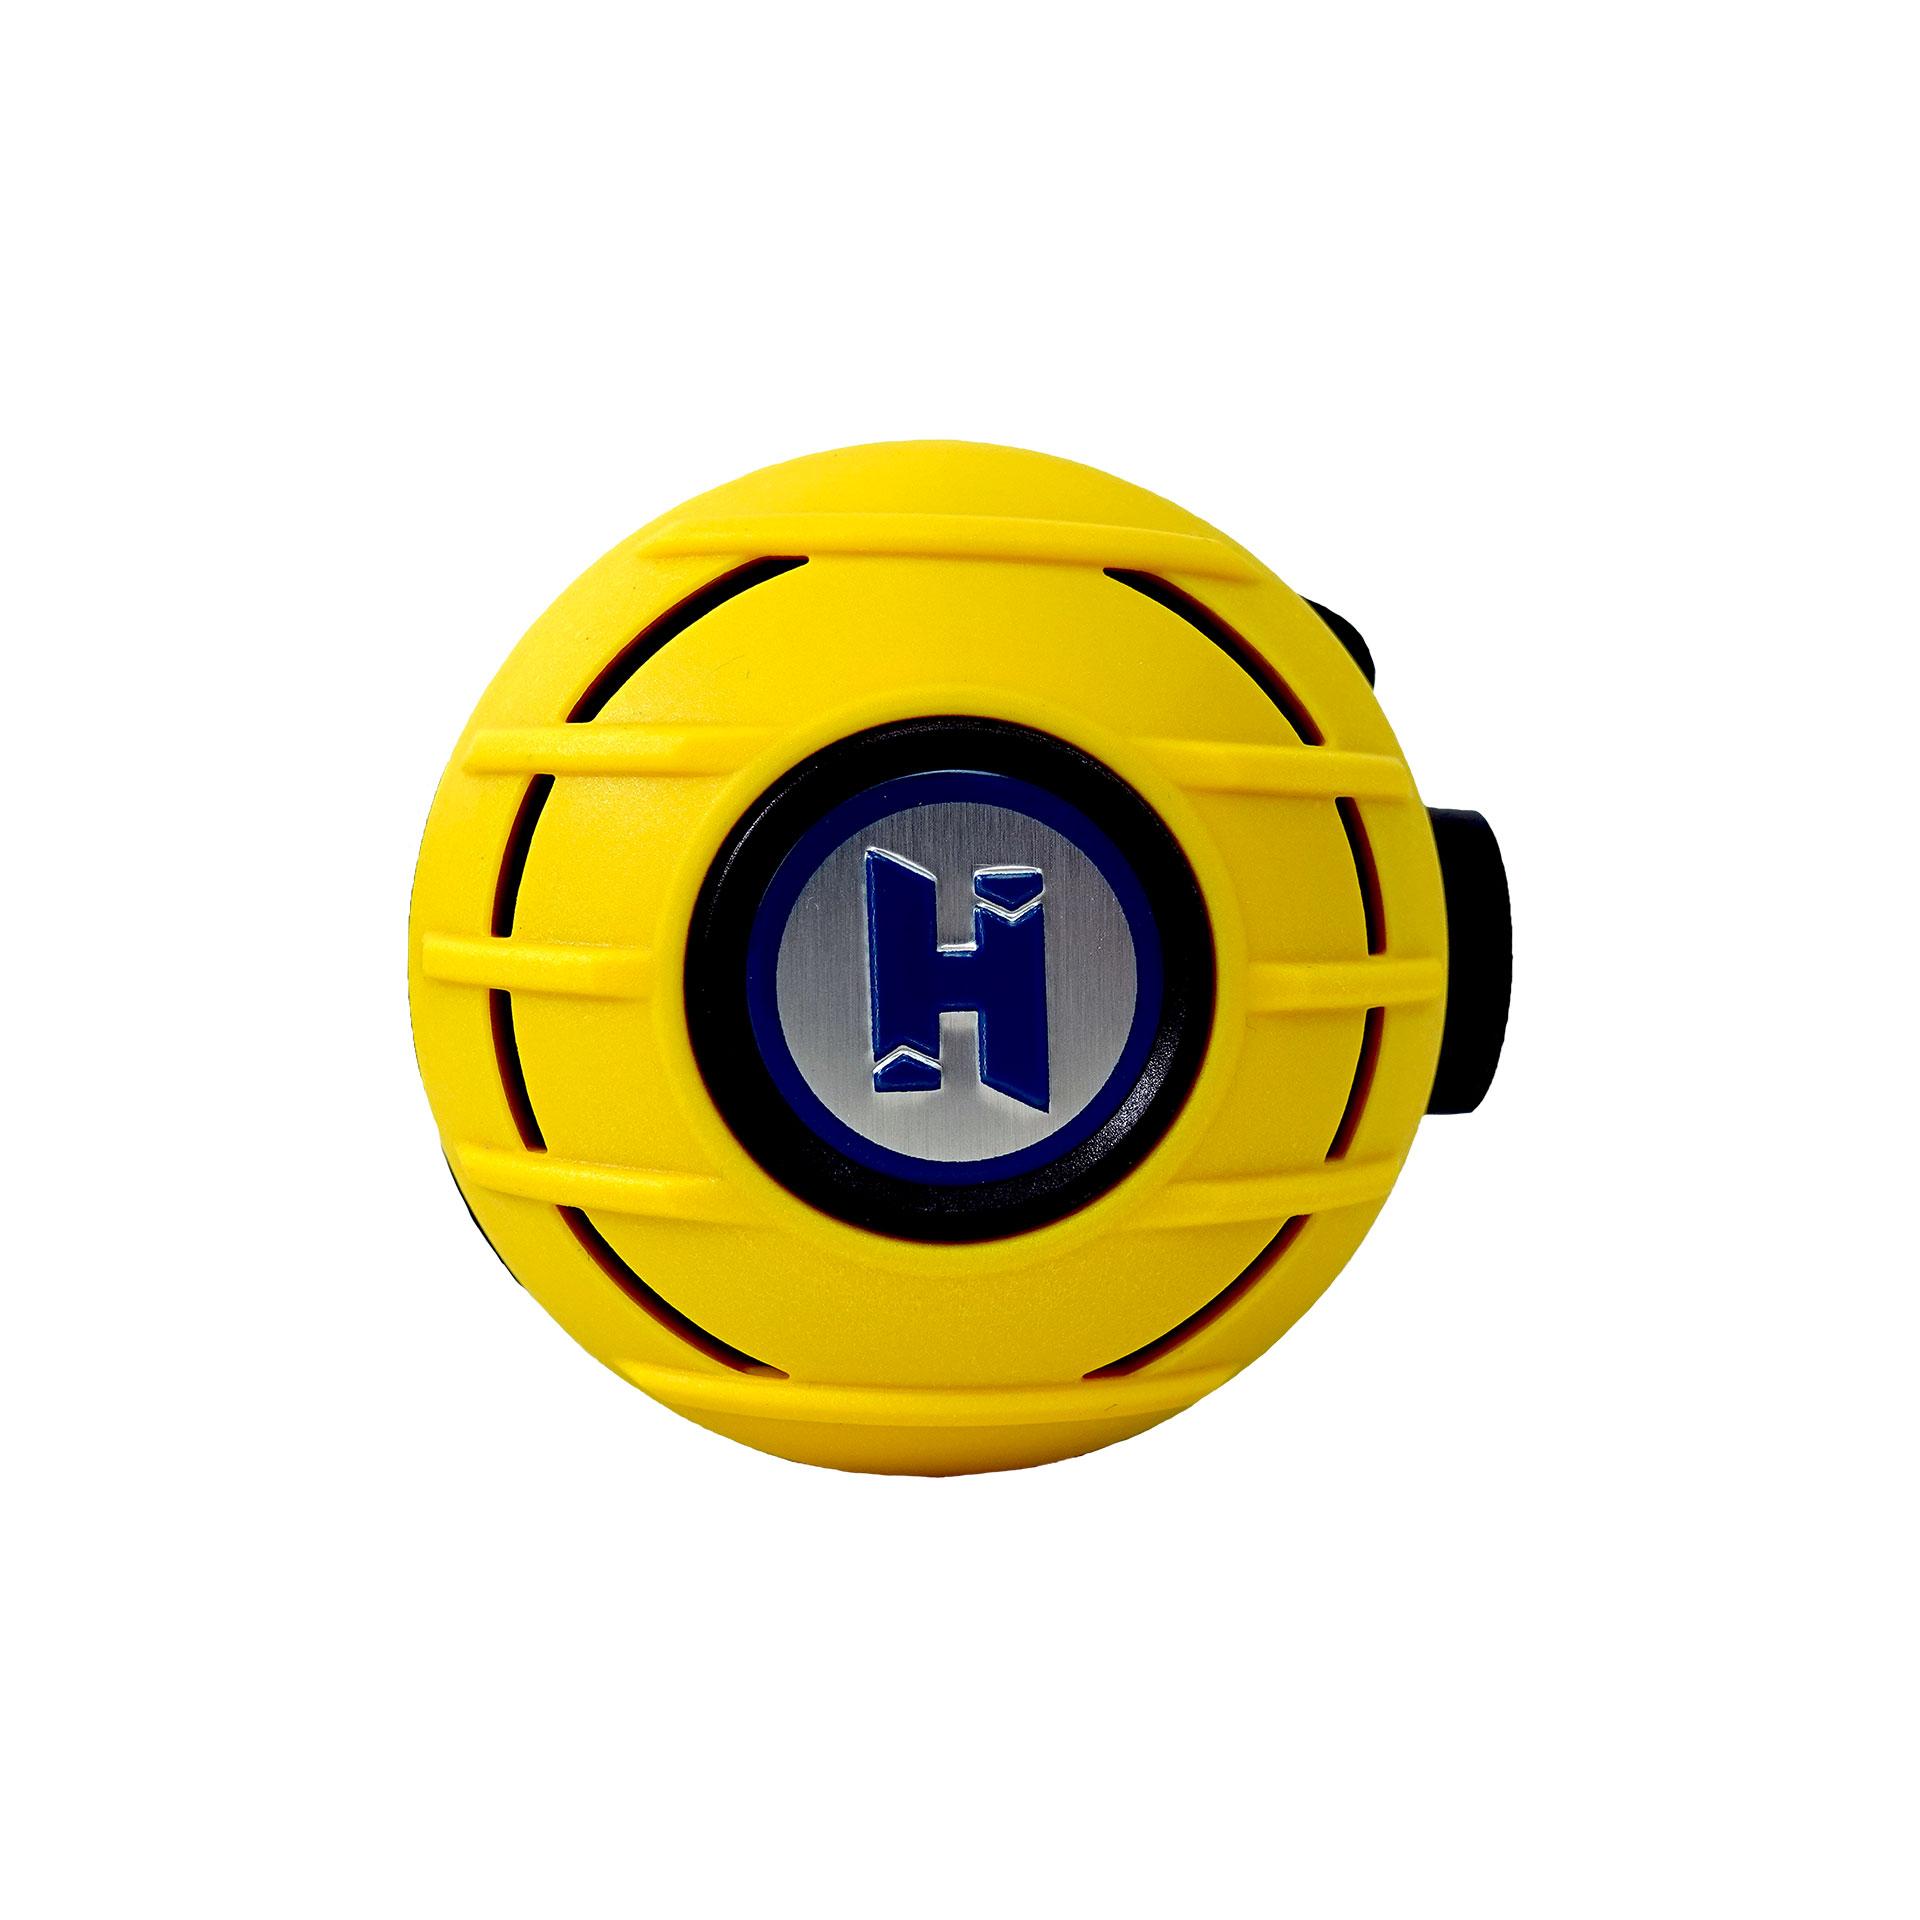 Aura Second Stage Regulator (Yellow Edition)